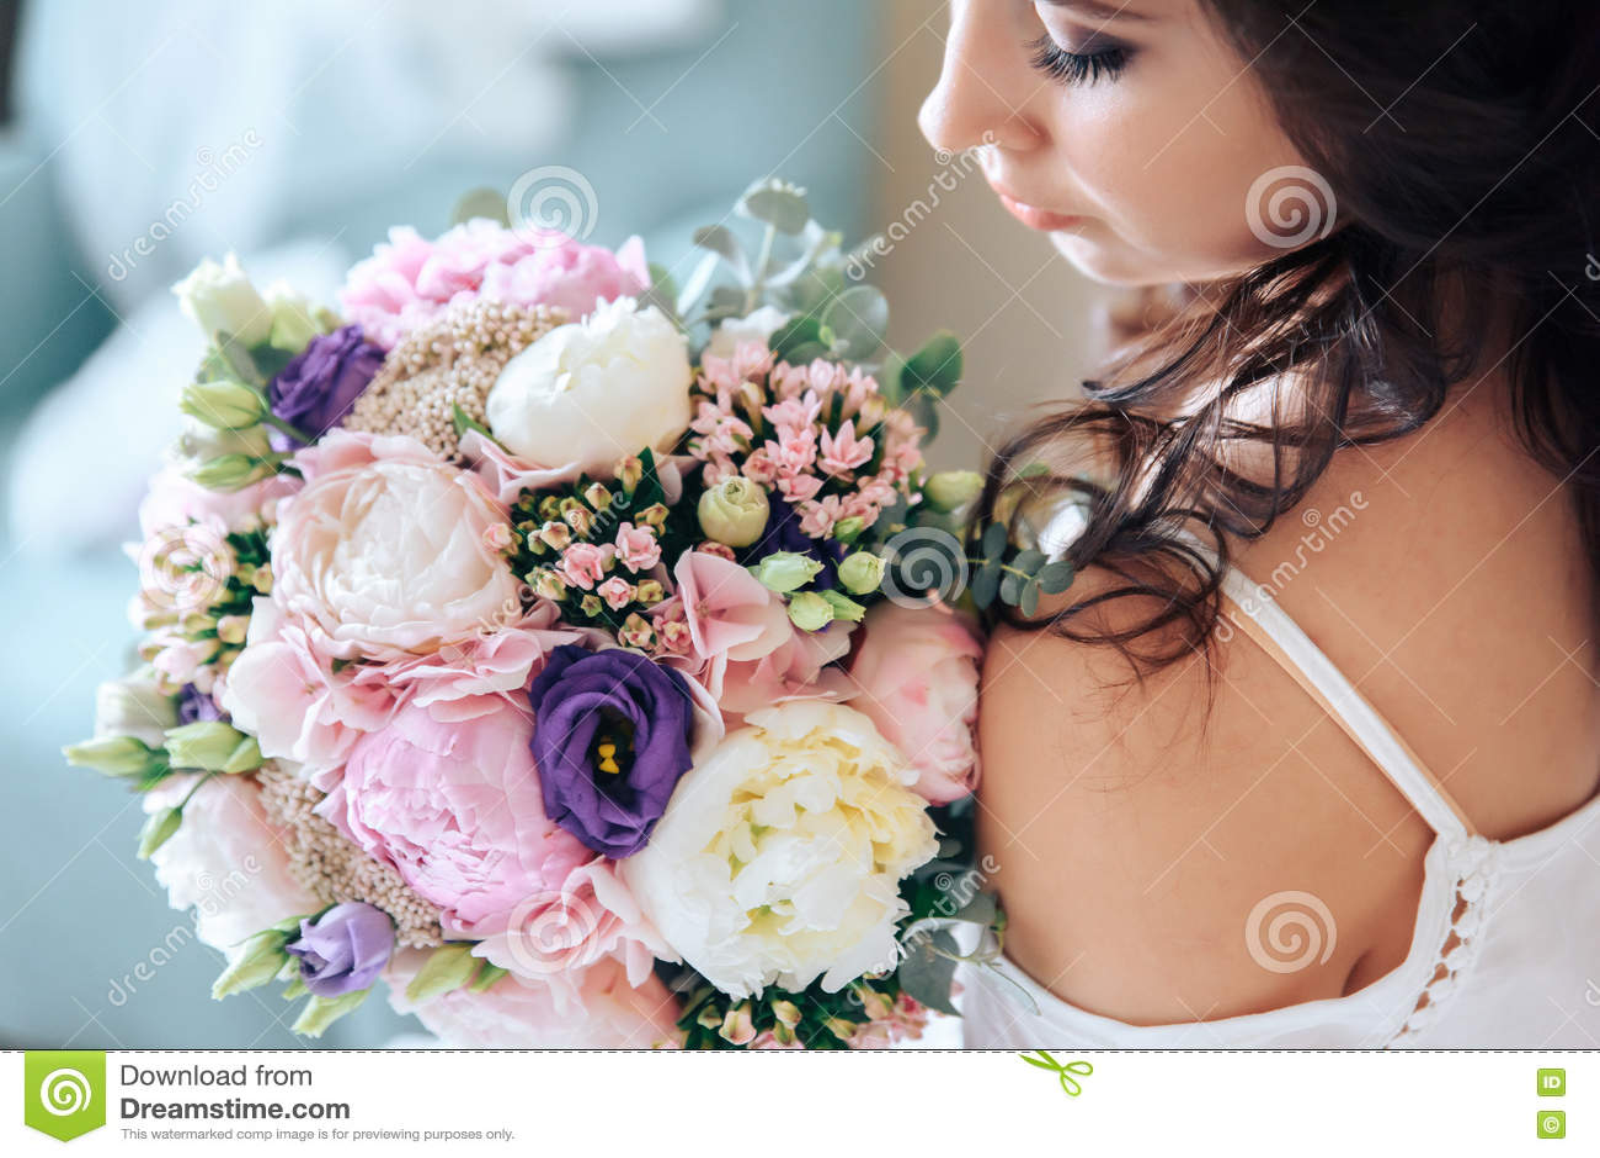 f8625c0b3215 Νύφη που κρατά μια ανθοδέσμη των λουλουδιών σε ένα αγροτικό ύφος